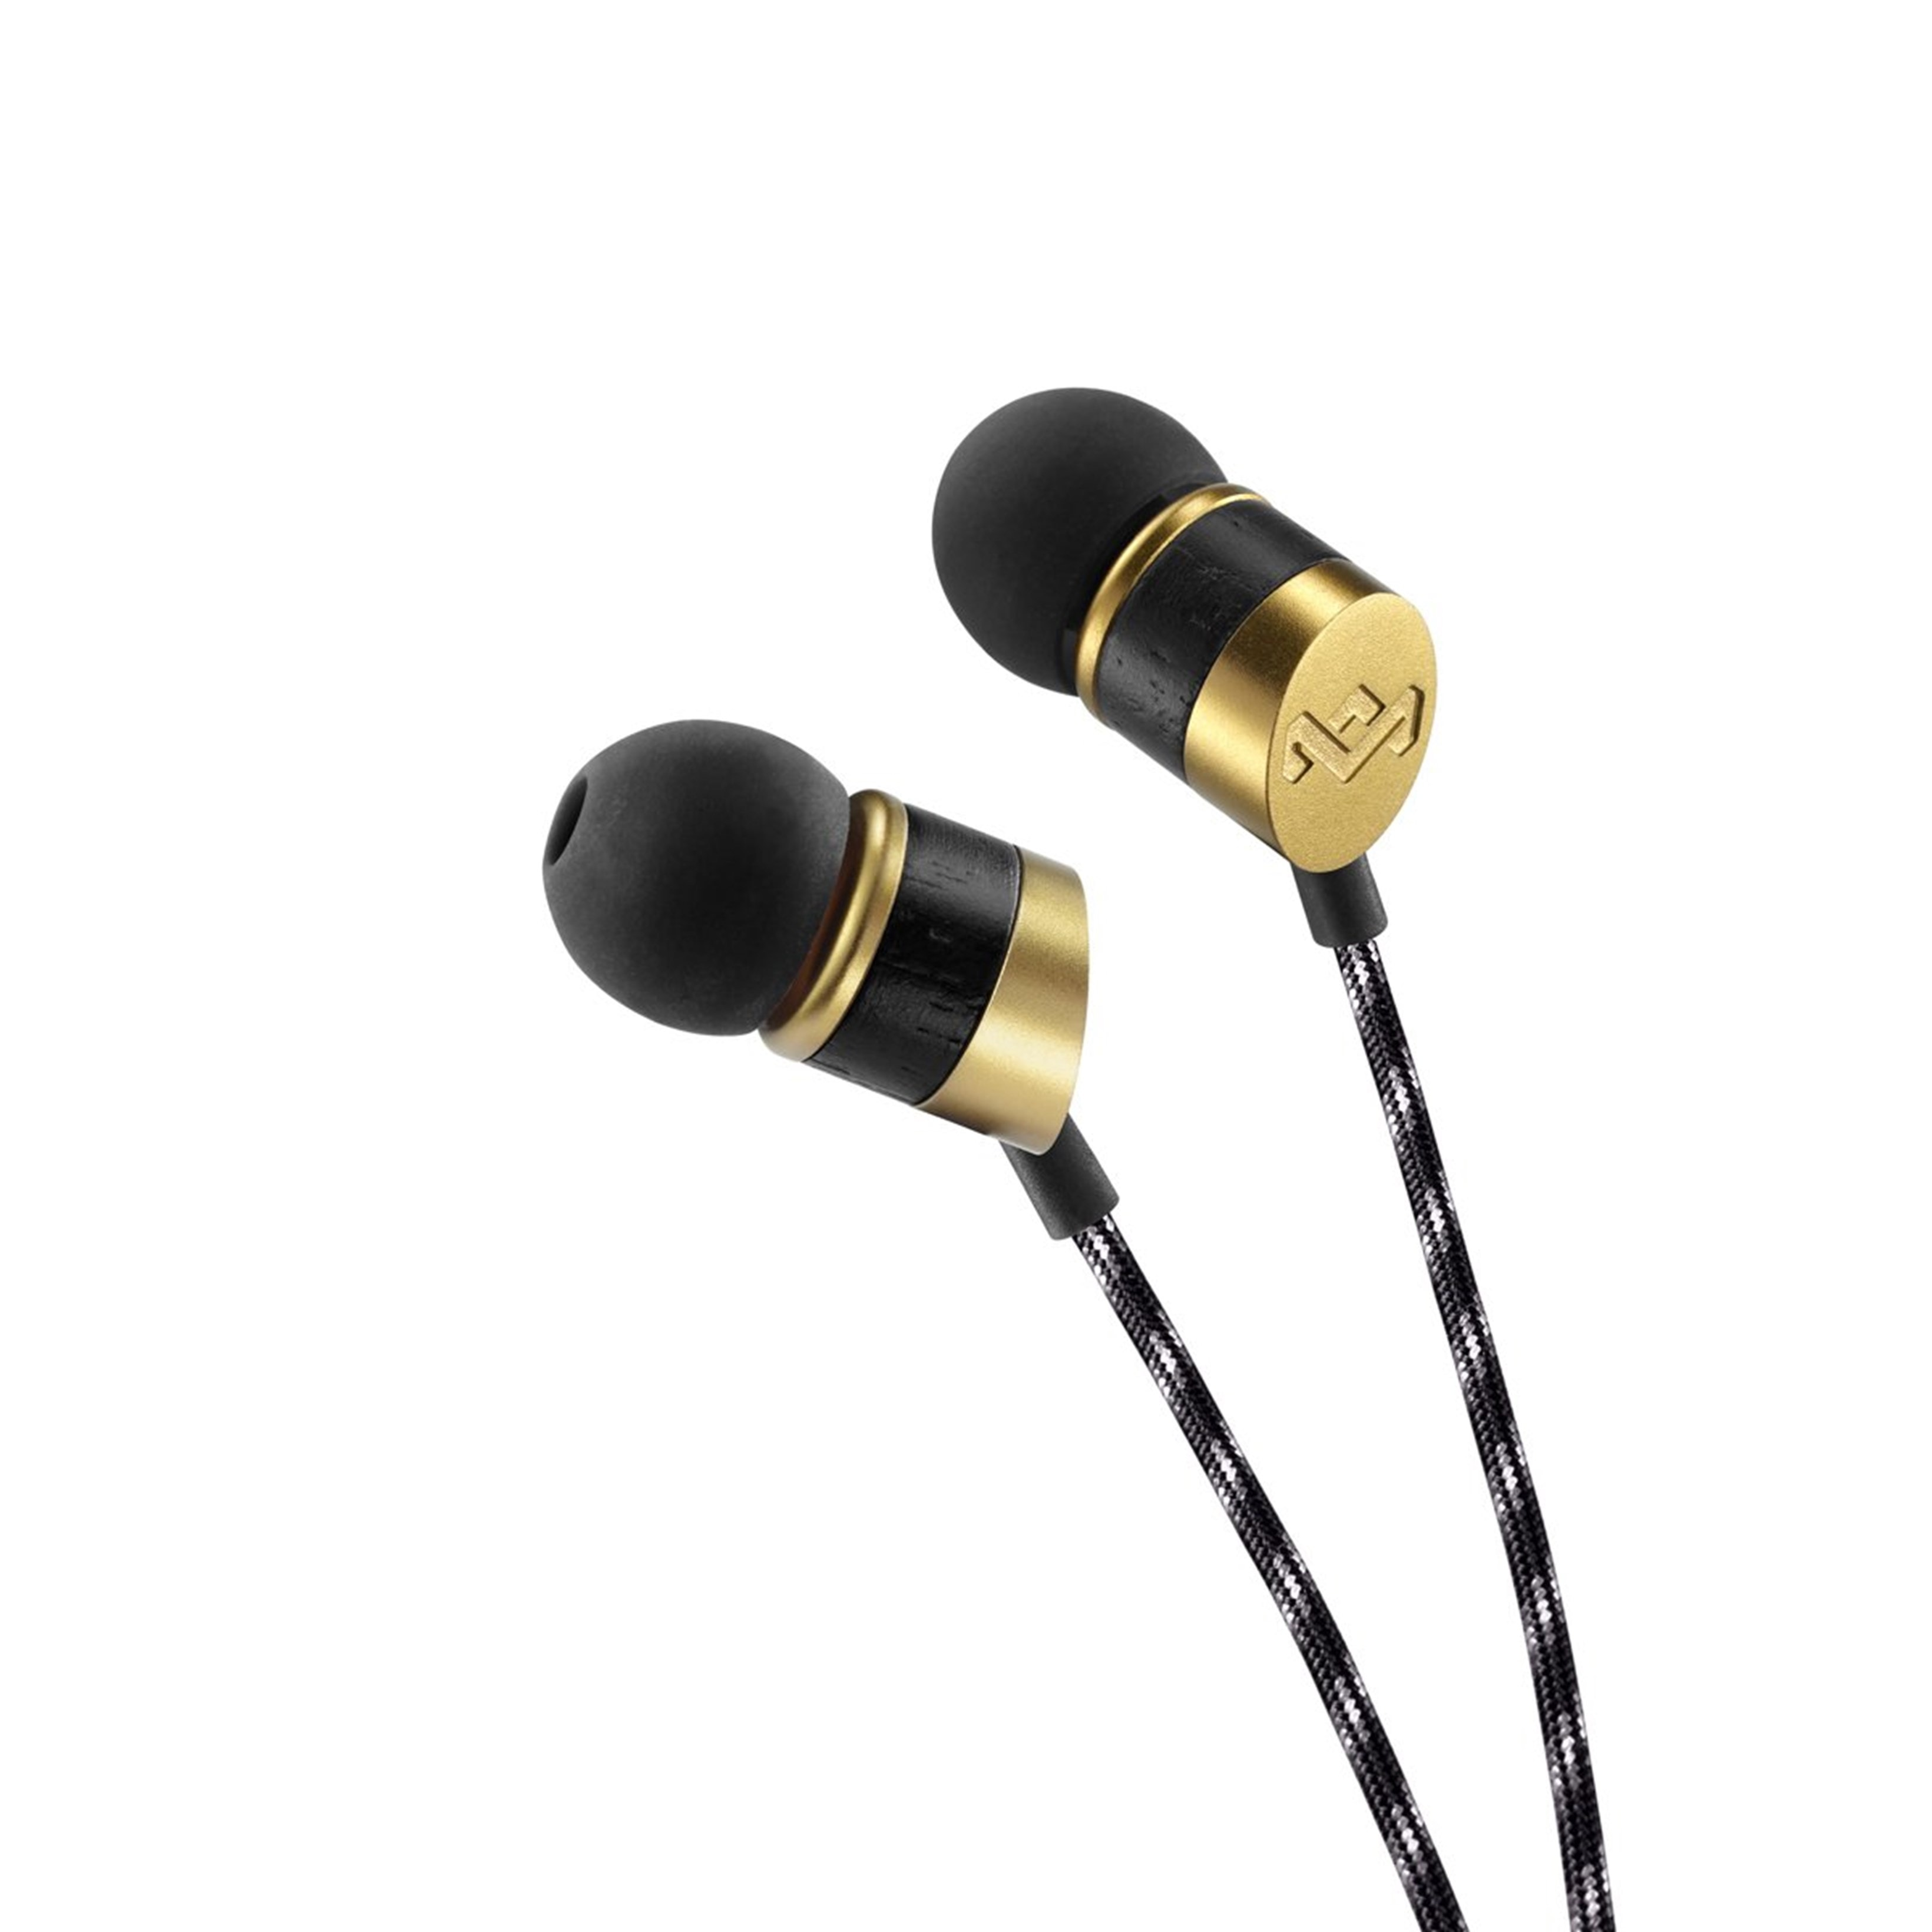 House Of Marley Uplift Grand Earphones W/Mic - 1